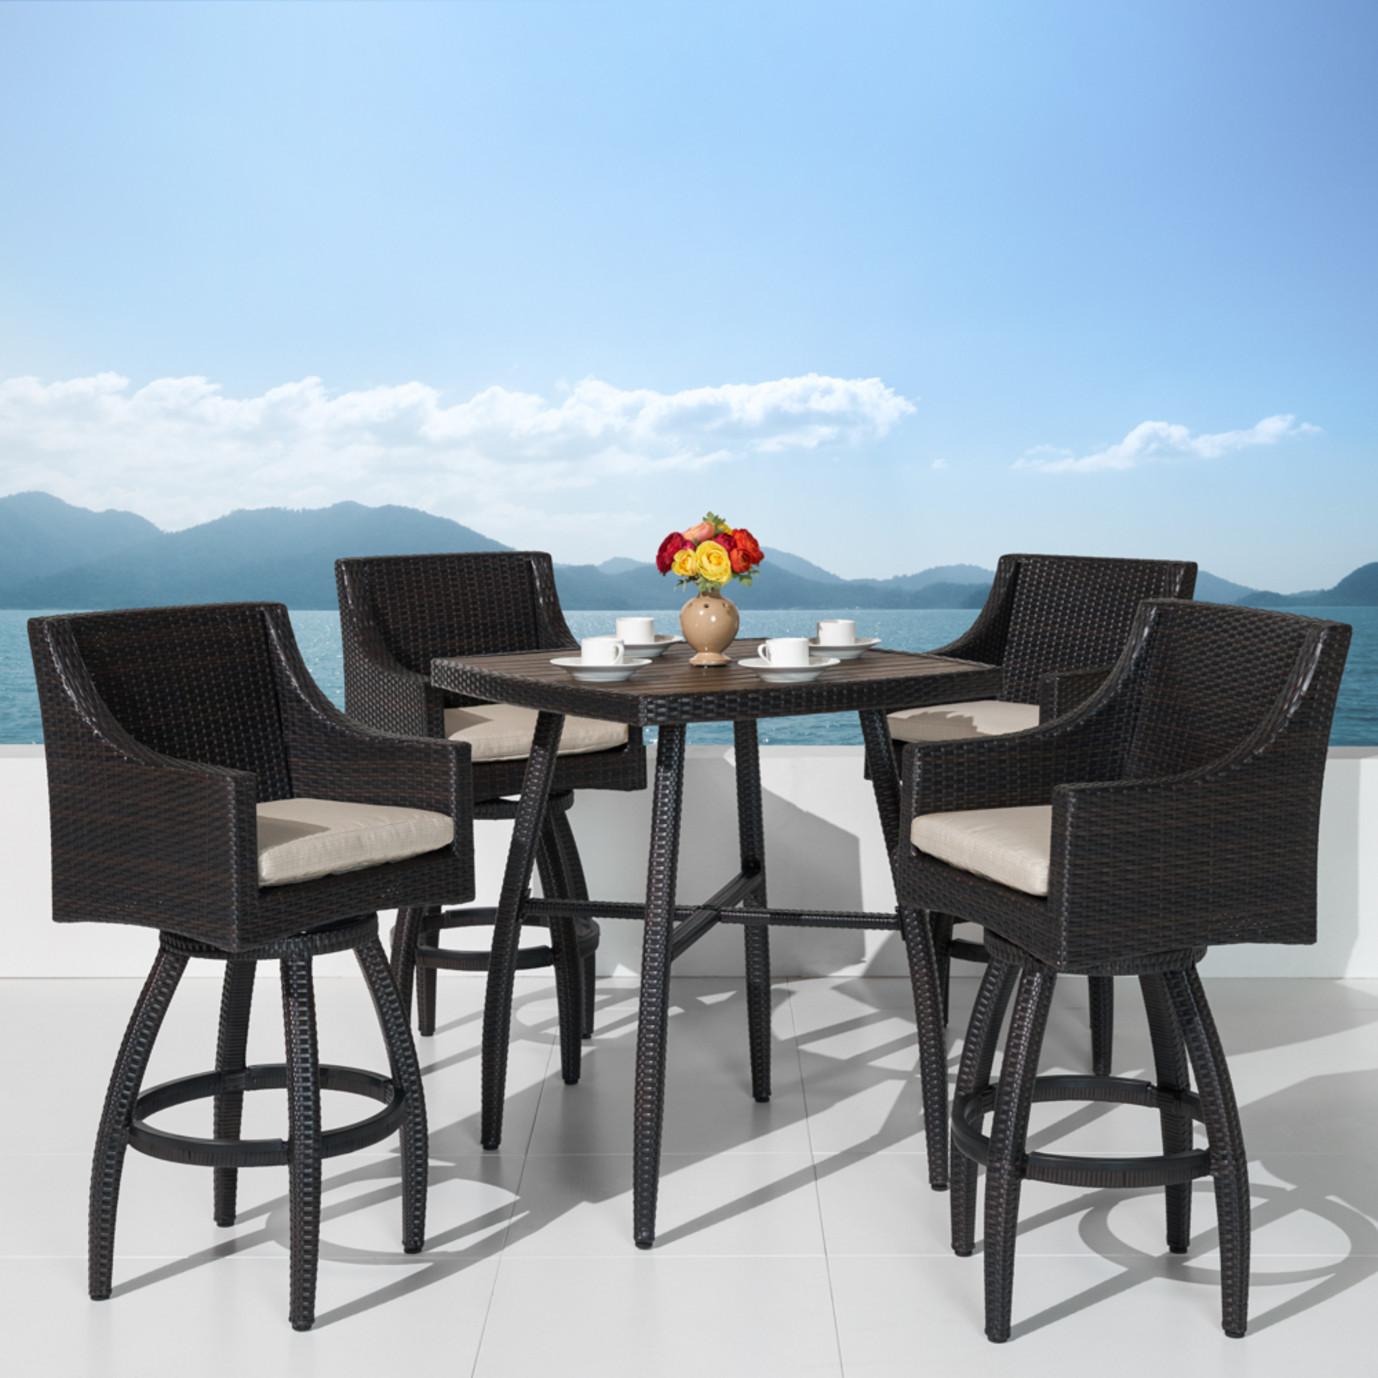 Deco™ 5 Piece Barstool Set - Slate Gray